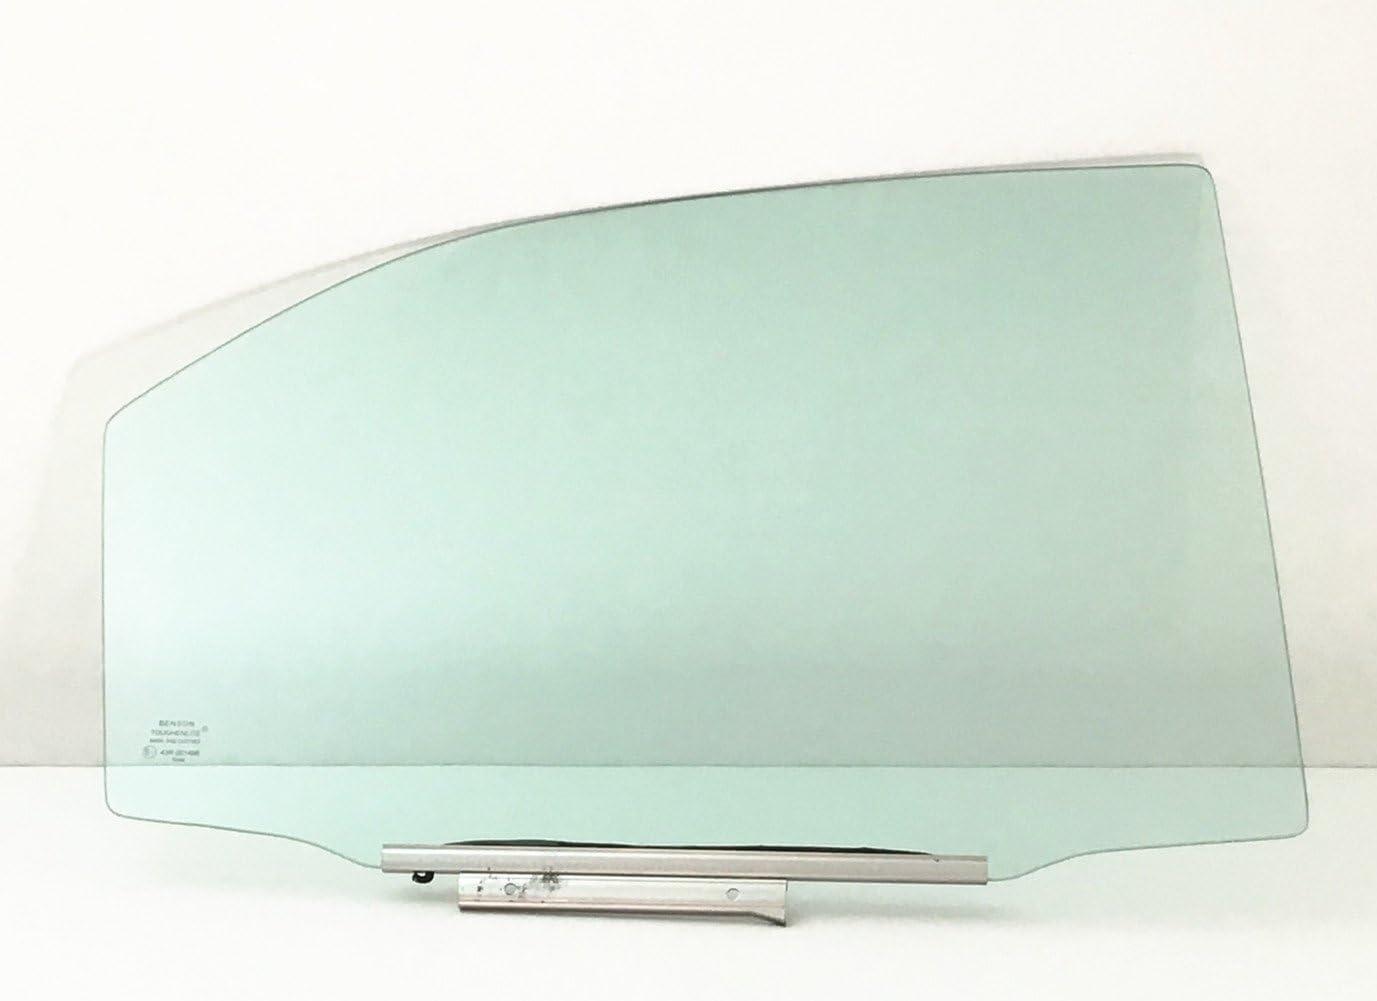 NAGD Passenger//Right Side Rear Door Window Replacement Glass for 1994-1997 Honda Accord 4 Door Sedan /& Wagon